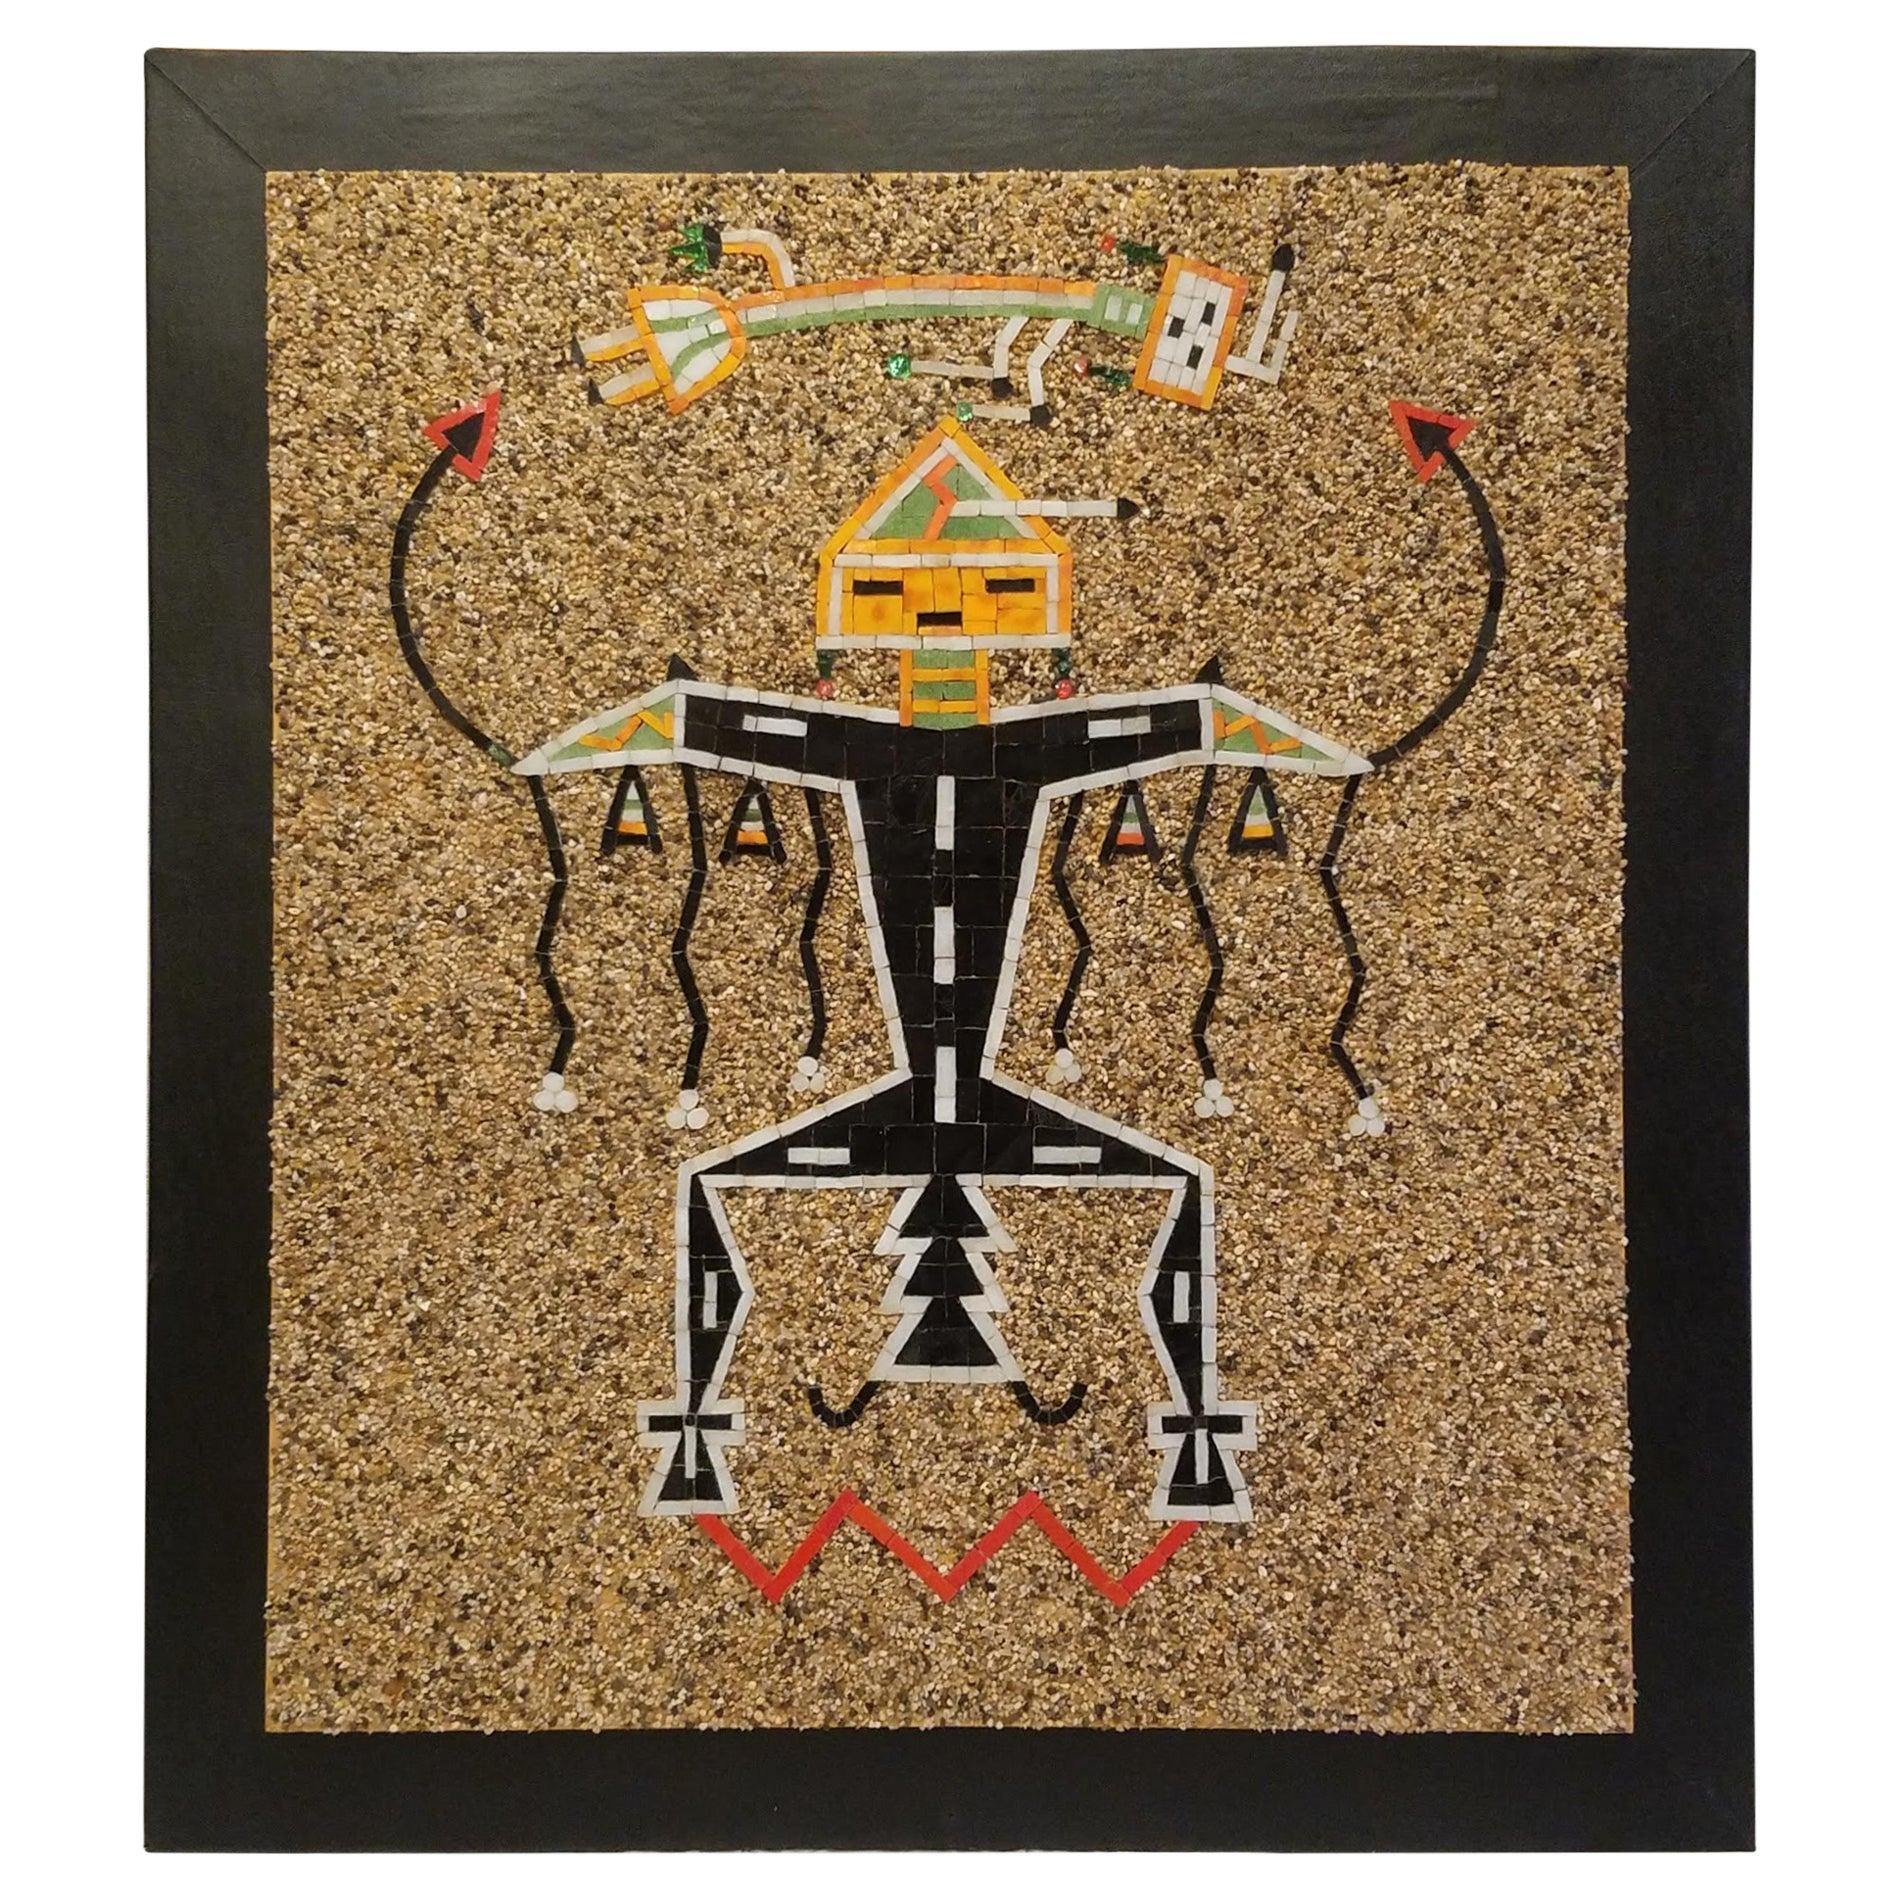 California Studio Navajo Sand Painting Mosaic Art Panel of Thunderbird, 1960s